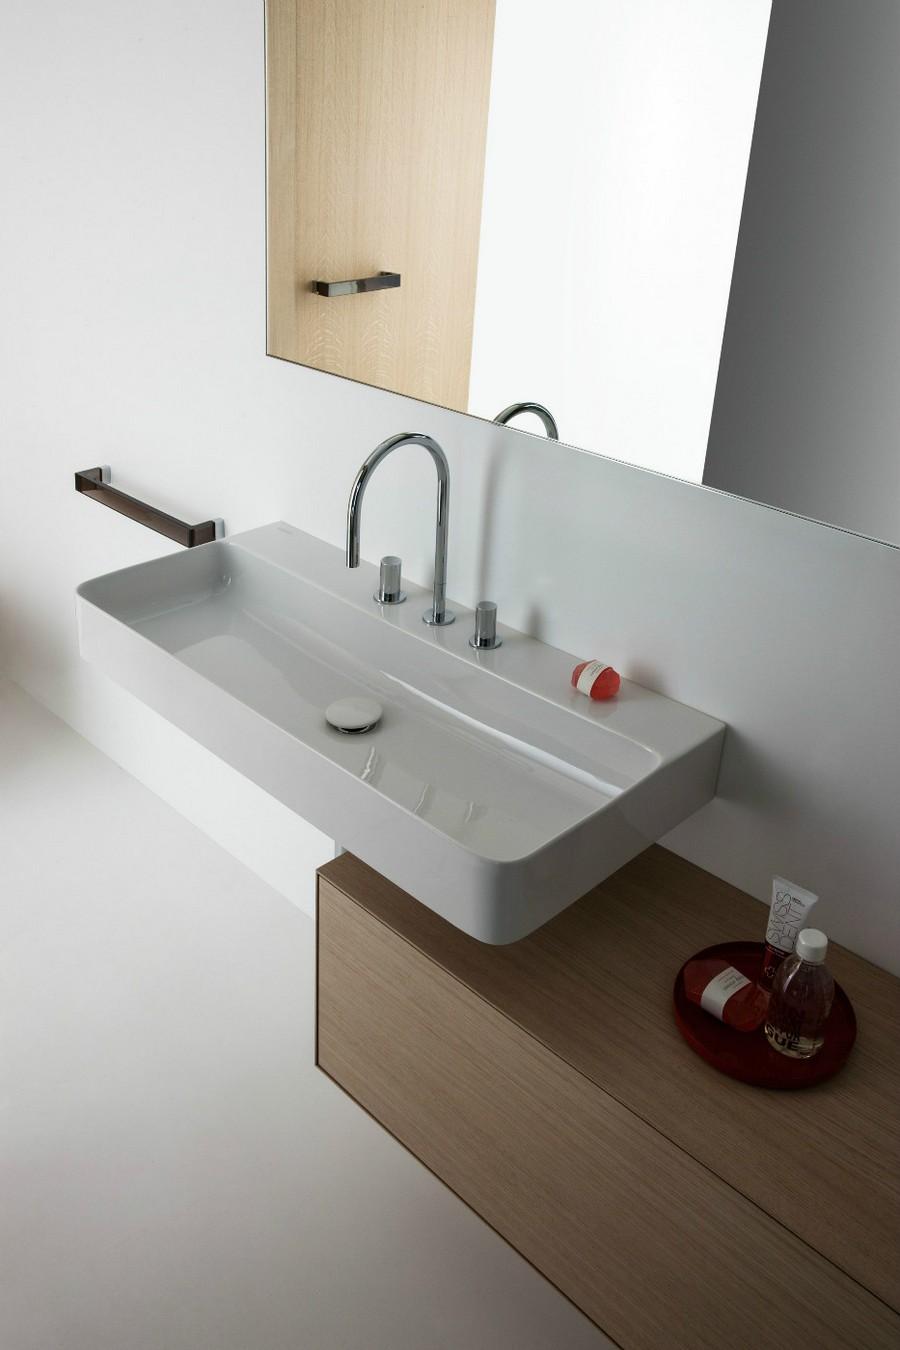 7-3-Laufen-beige-bathroom-interior-design-wash-basin-vanity-unit-wall-mounted-wooden-cabinet-mirror-rectangular-sink-towel-holder